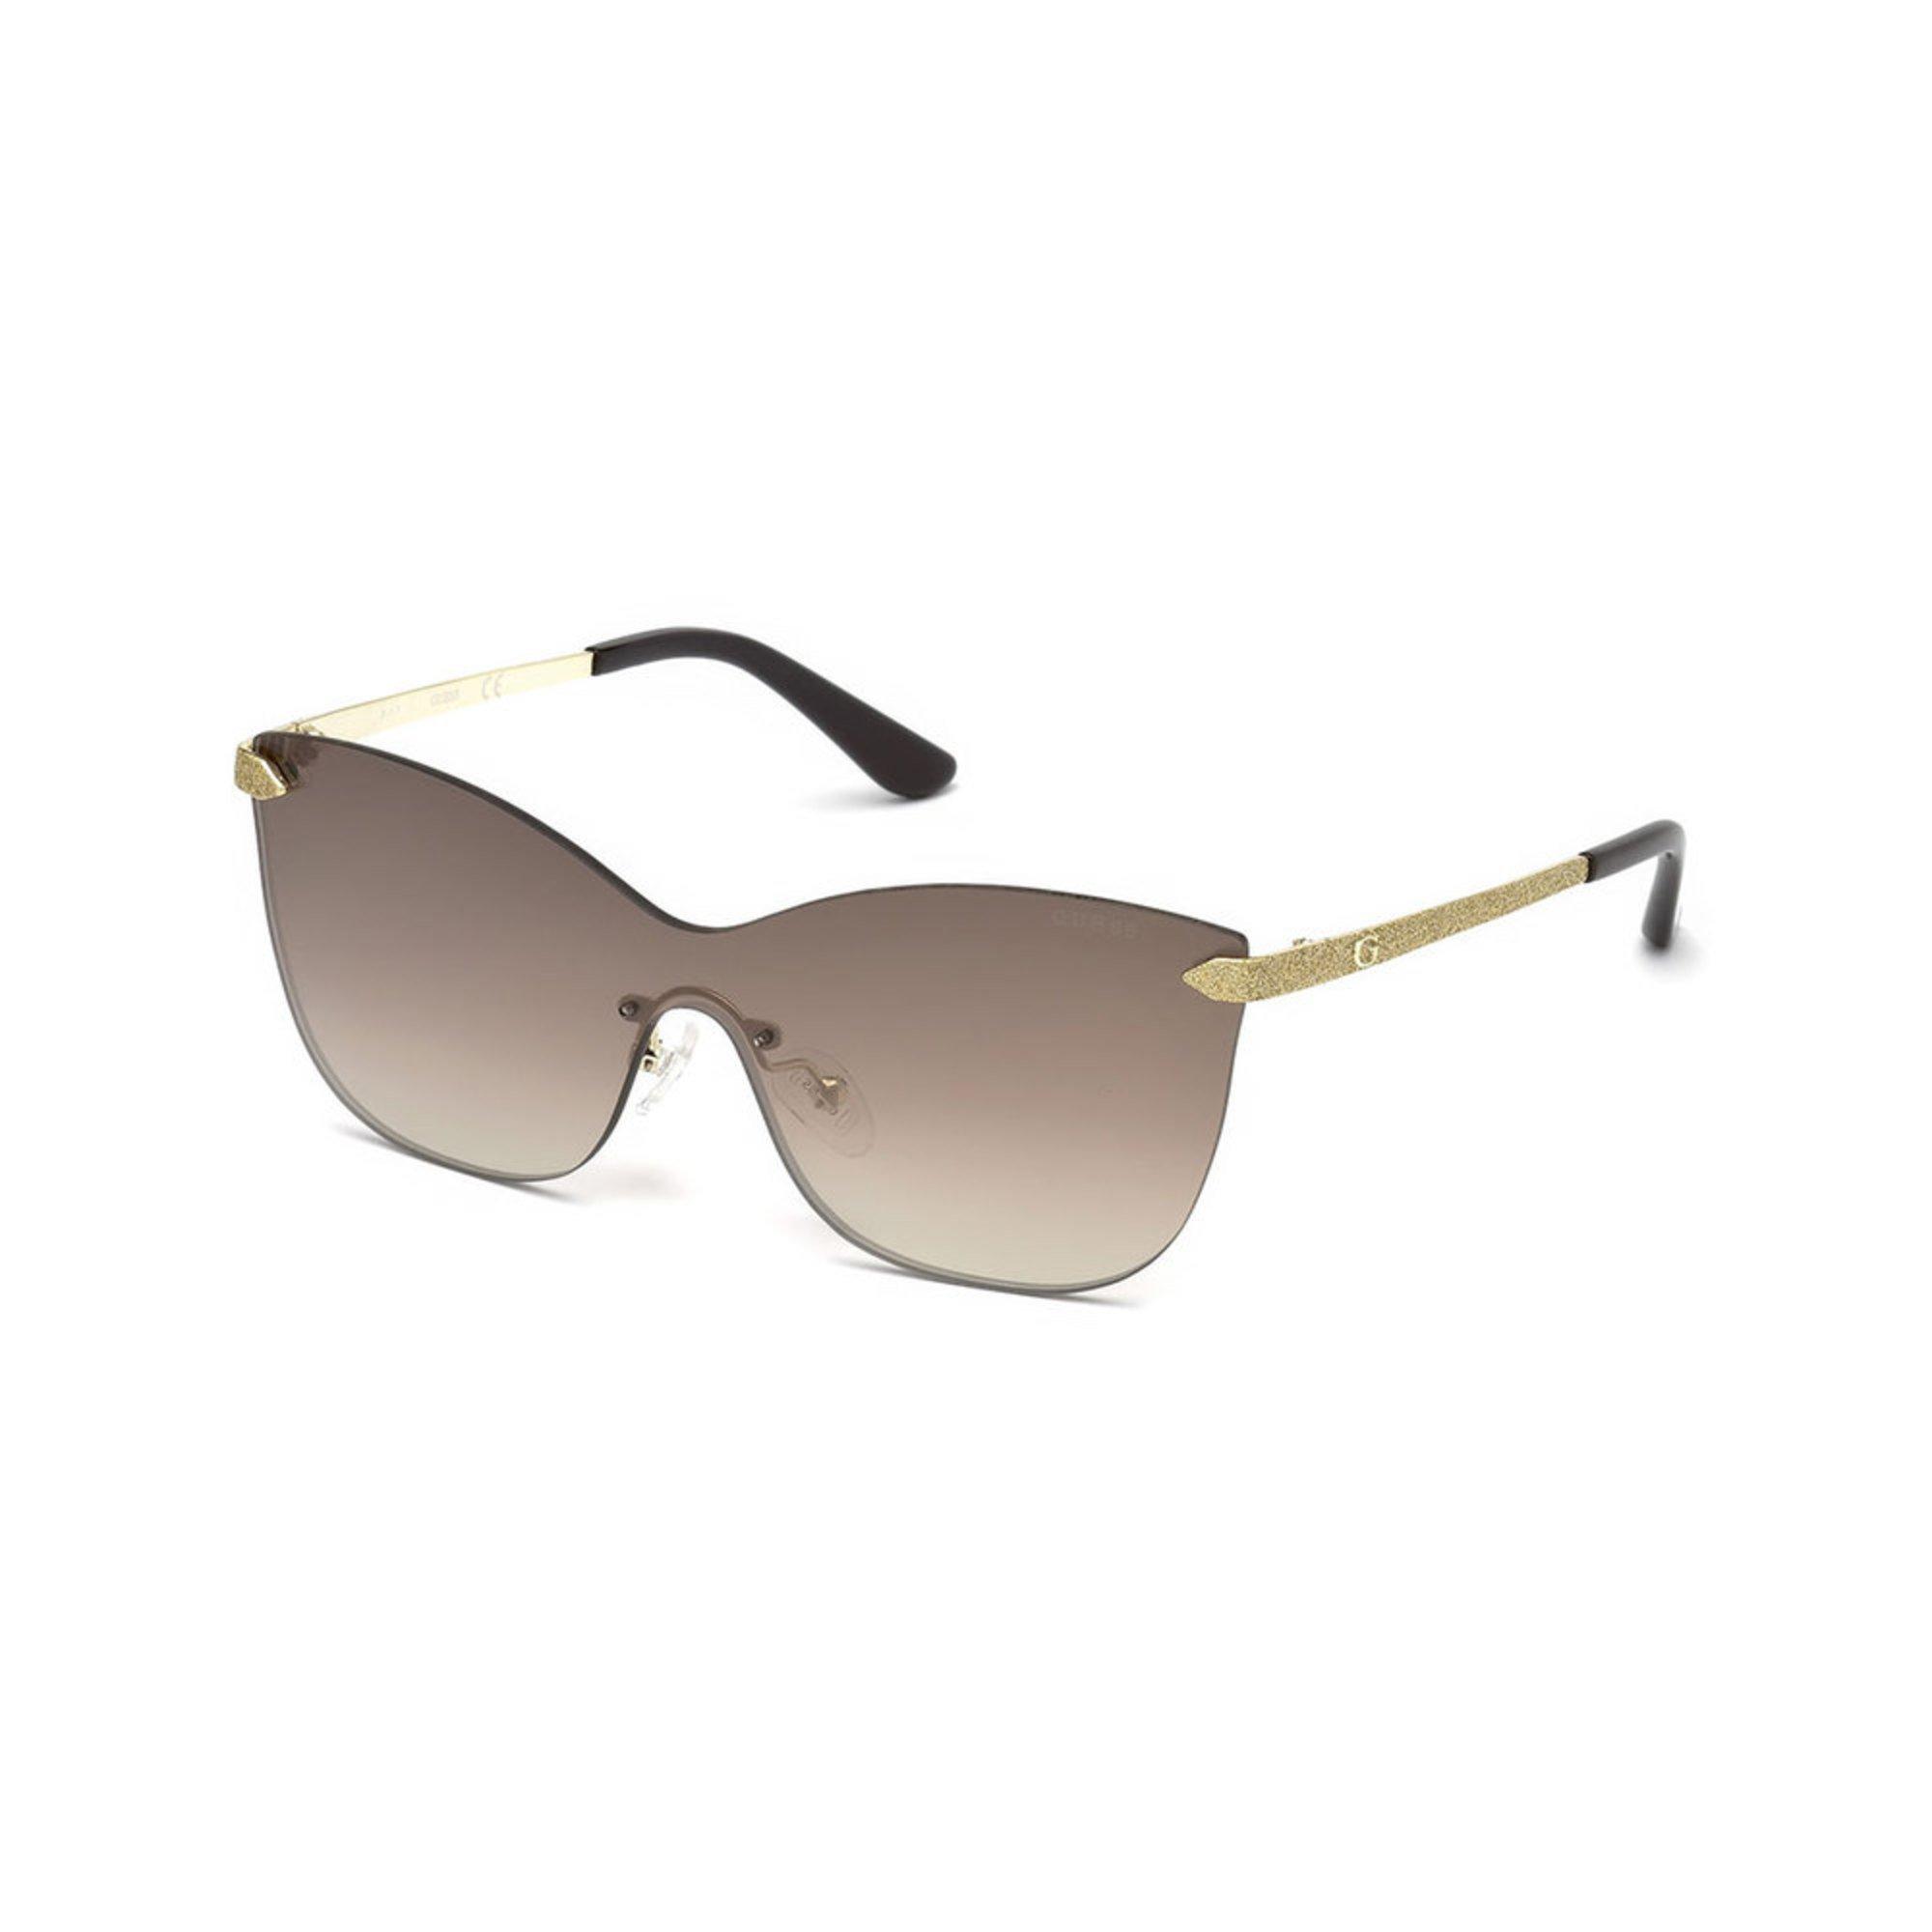 57781e2a591dc Guess. Guess Women s Shield Rimless Sunglasses